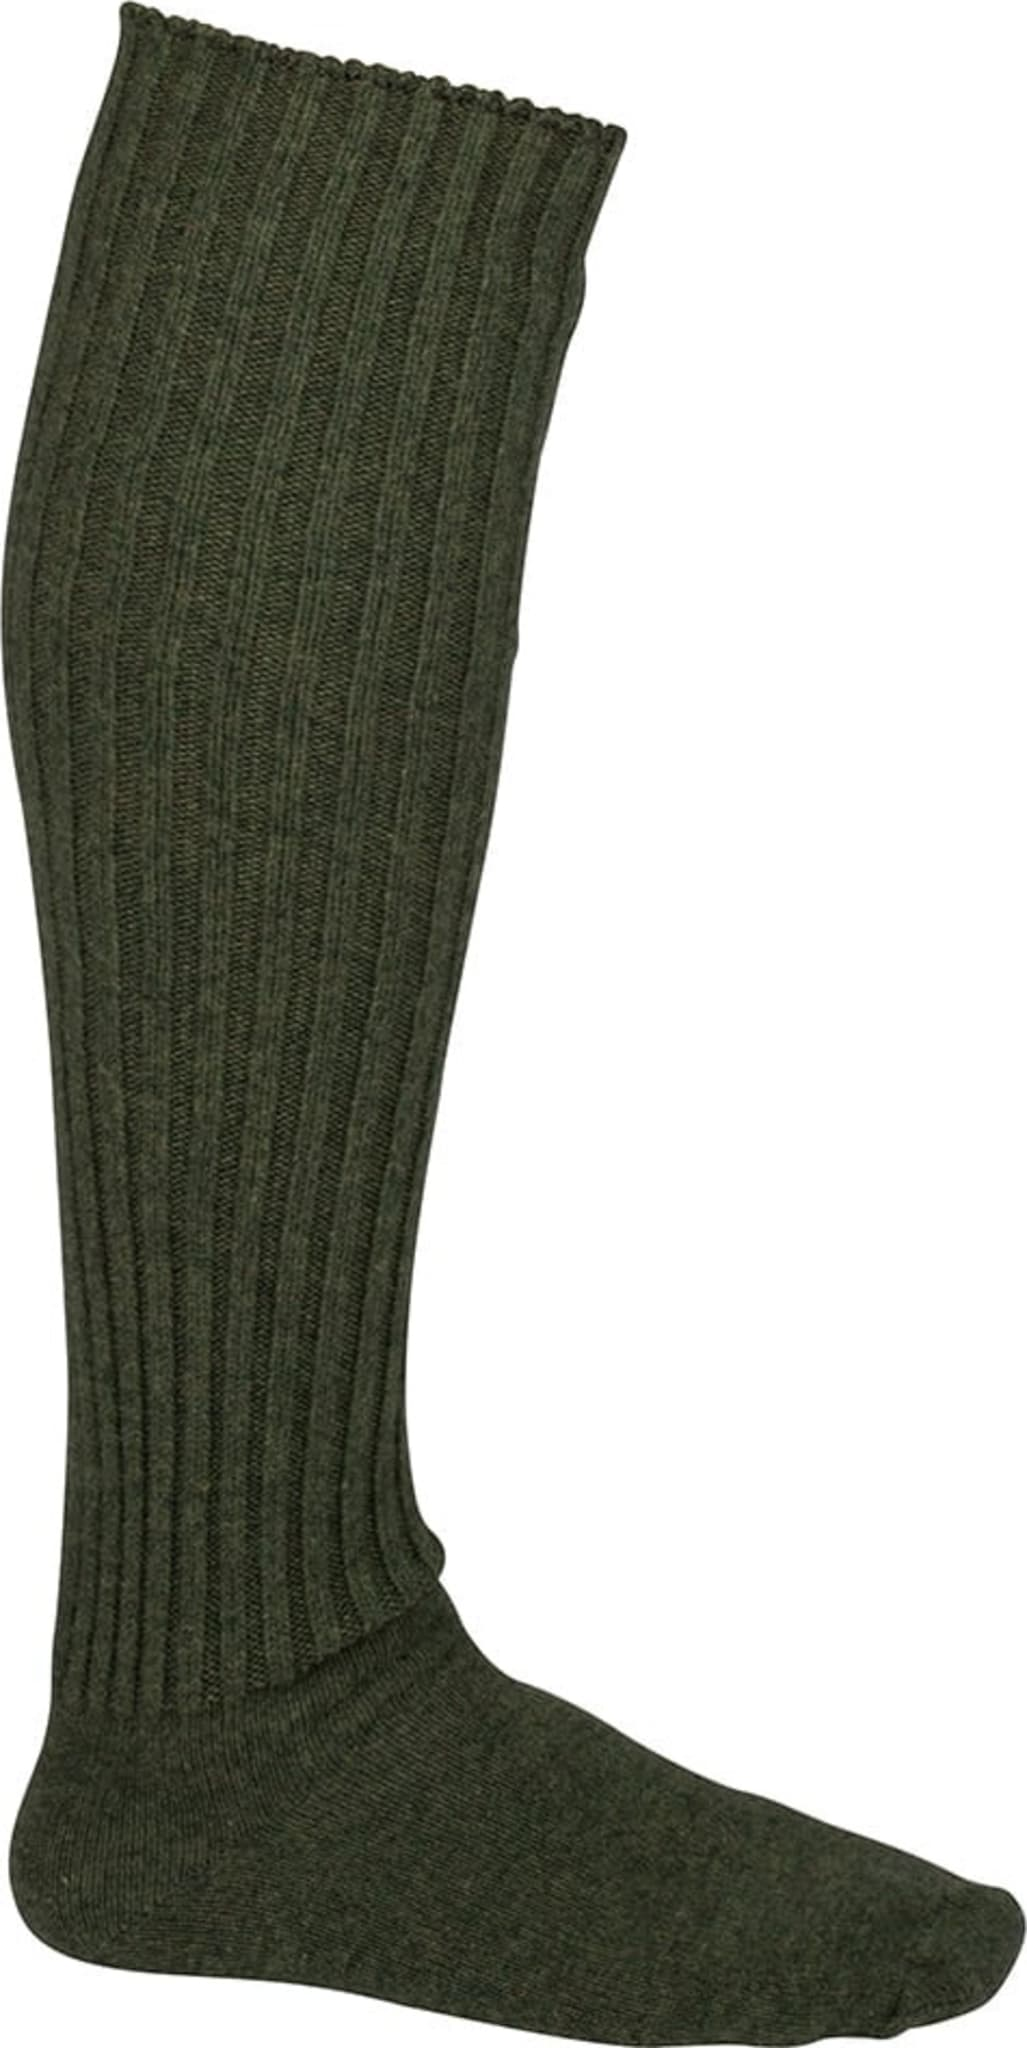 Amundsen Vagabond Sock Unisex